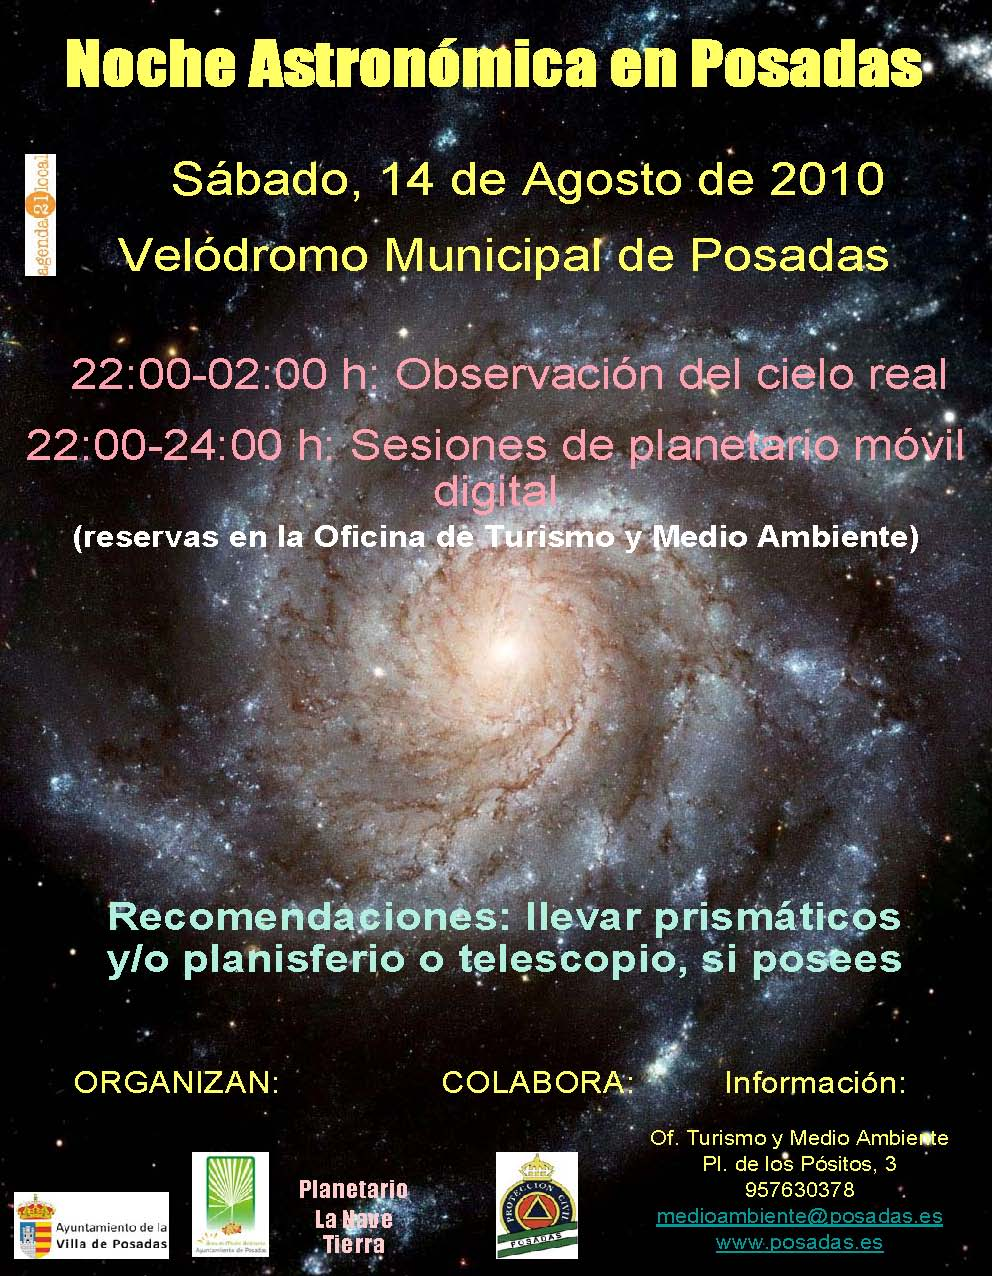 noche-astronomica-en-posadas